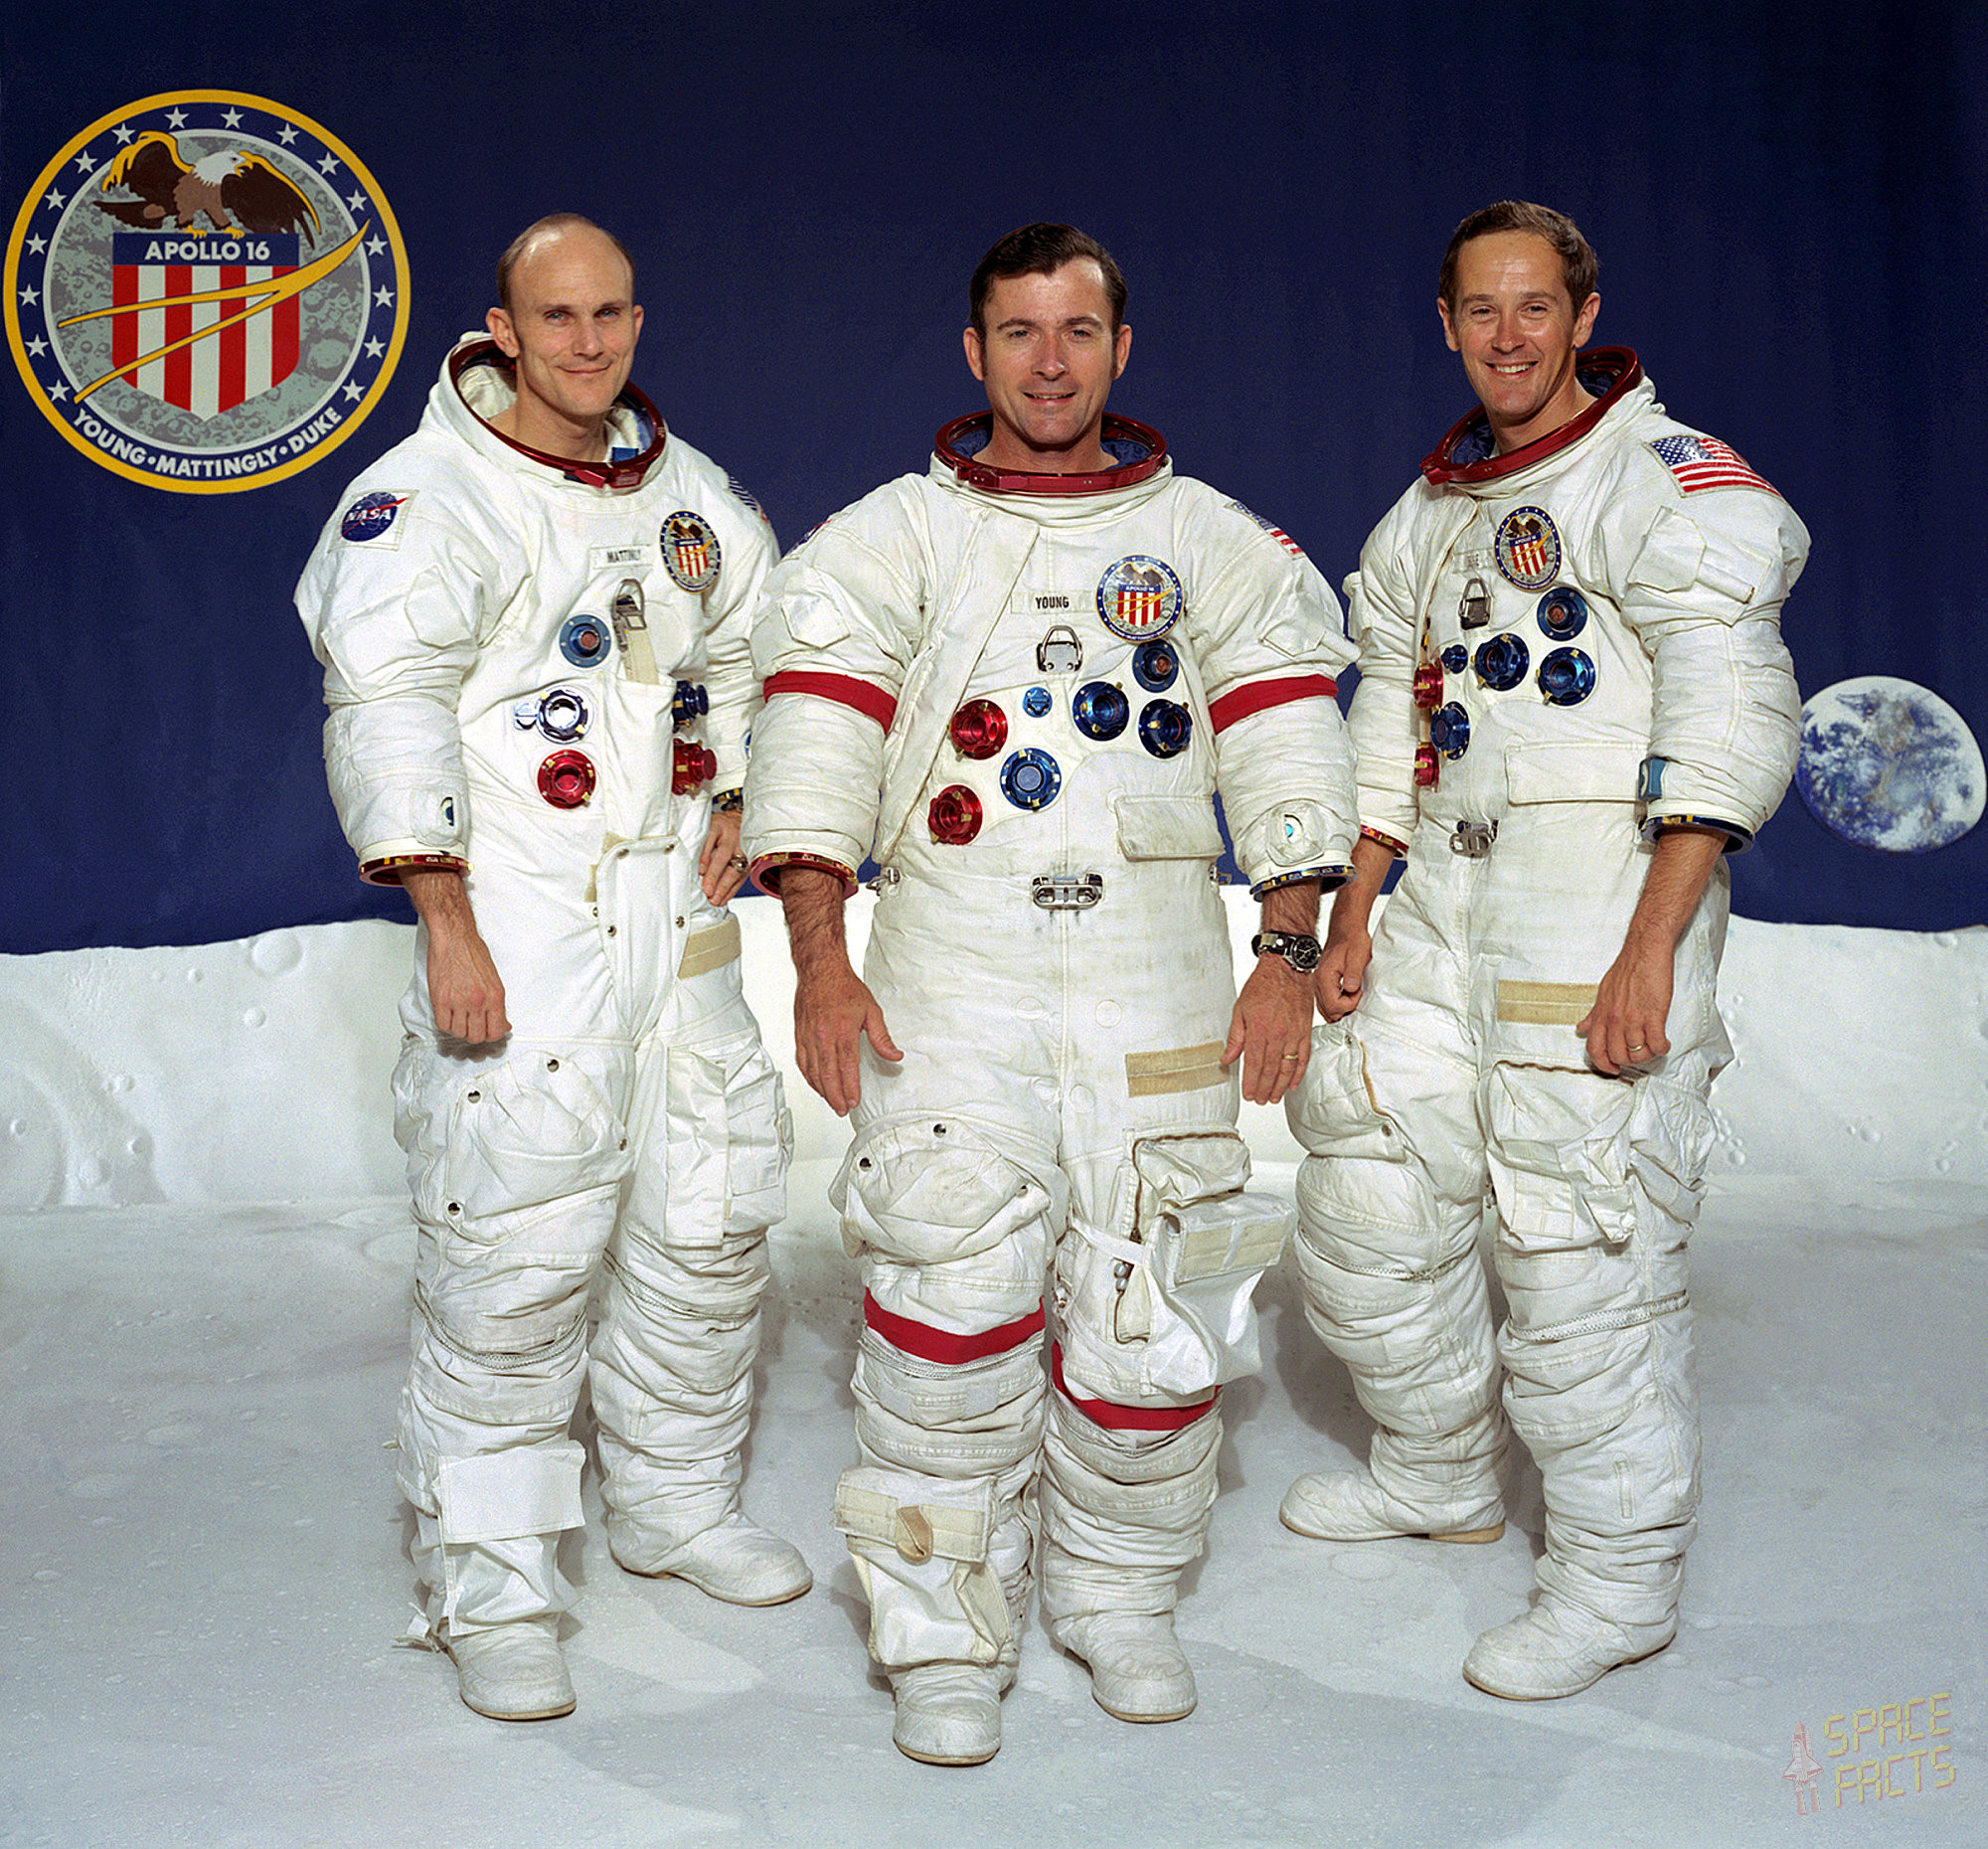 Spaceflight mission report: Apollo 16